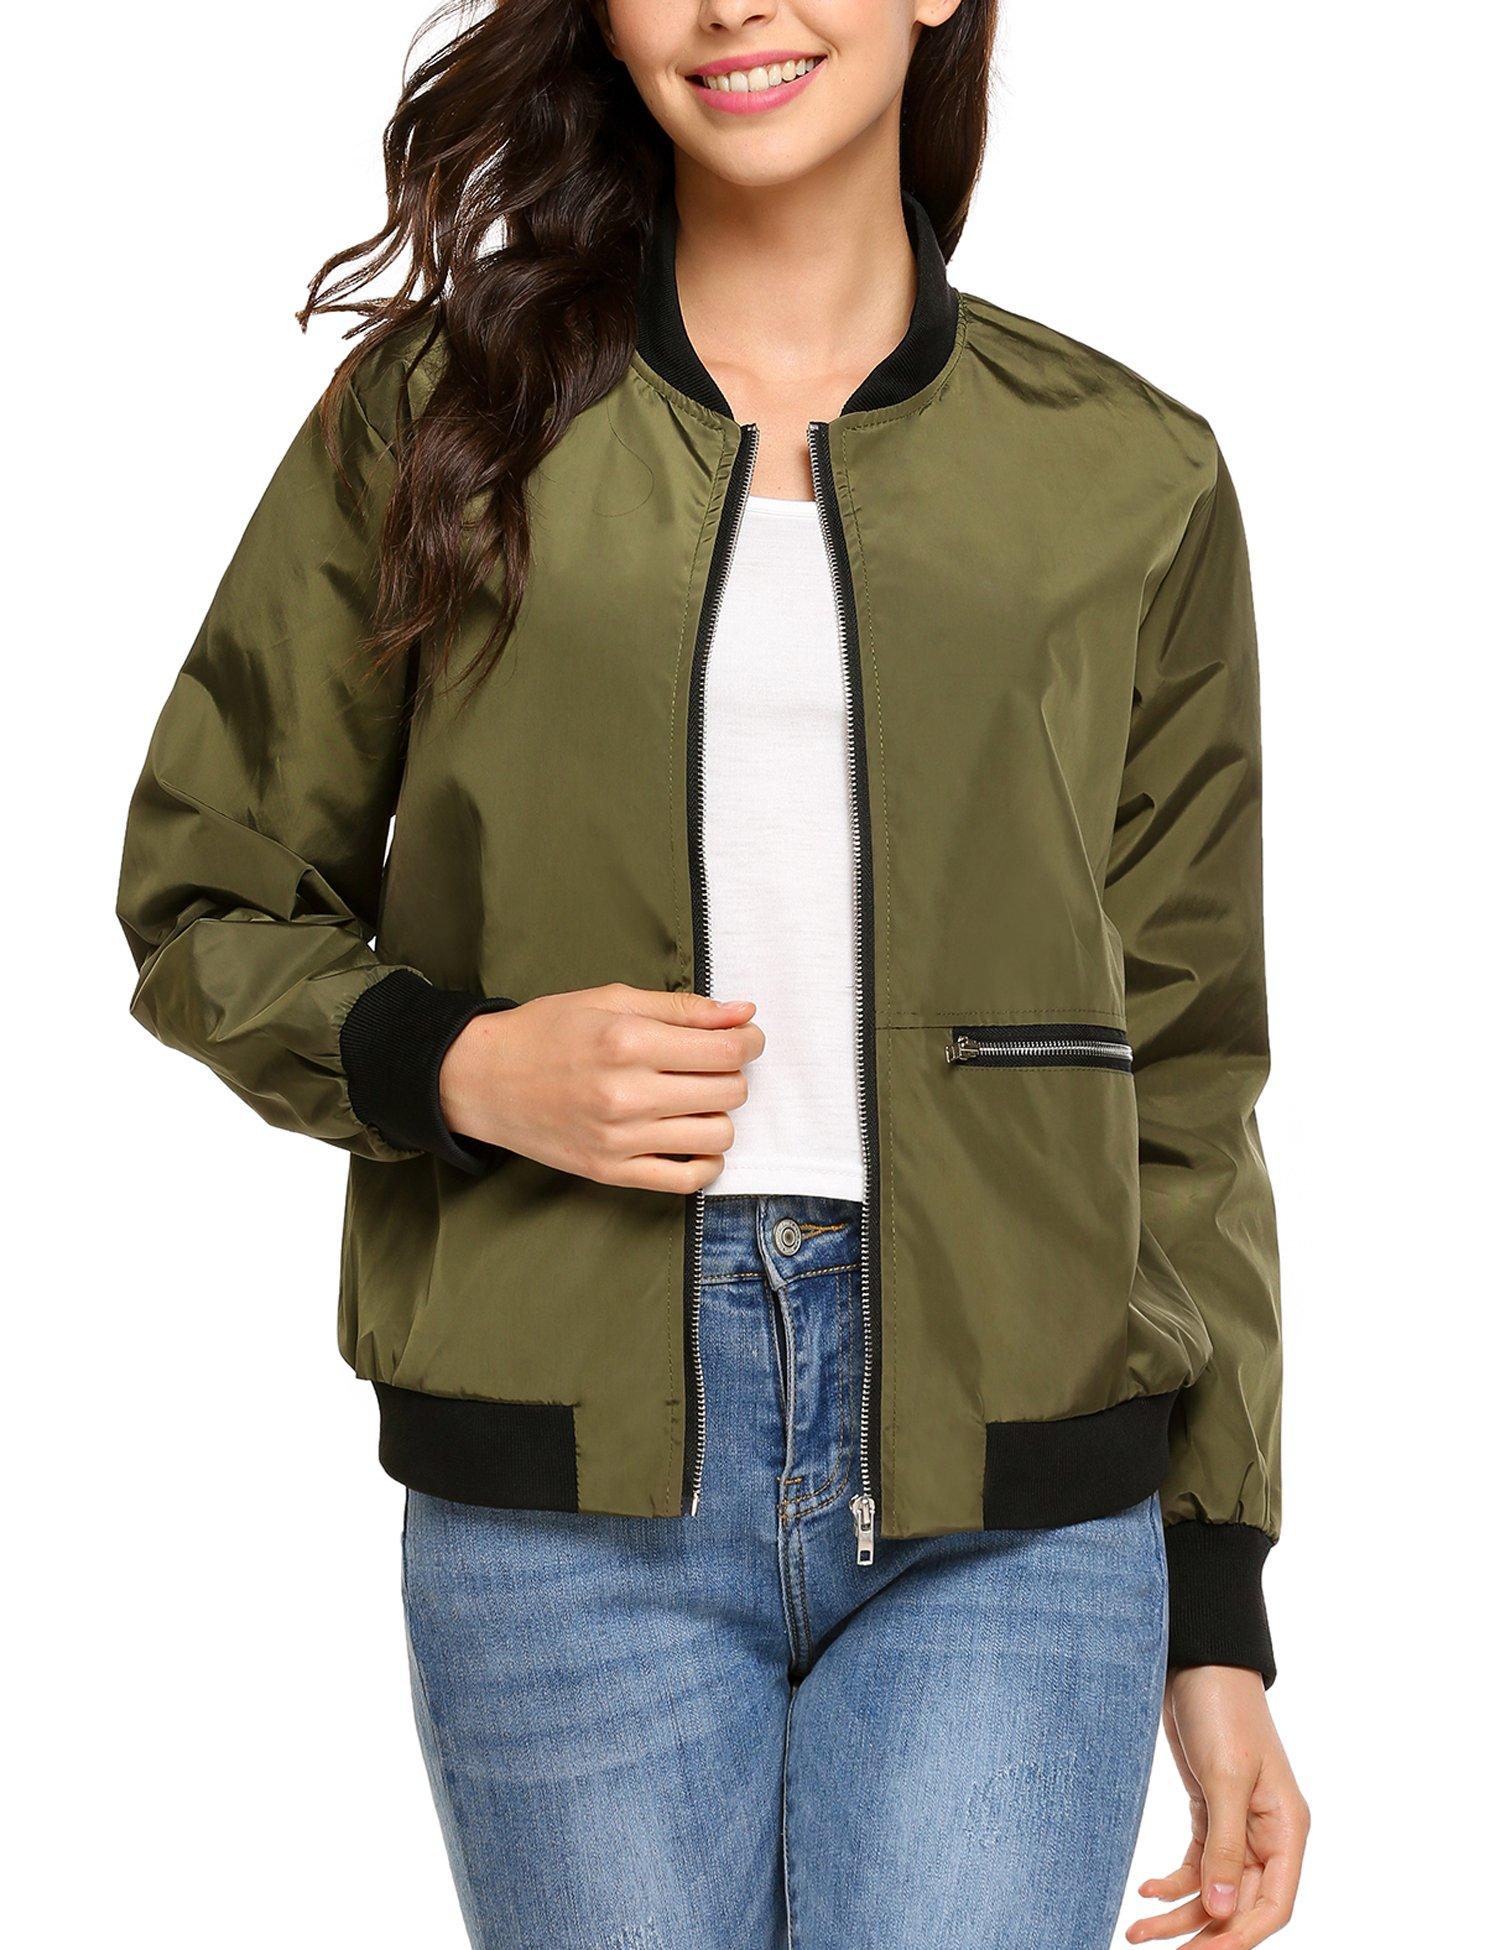 Beyove Women Basic Ruffle Top Baggy Quilted Jacket Casual Business Coat